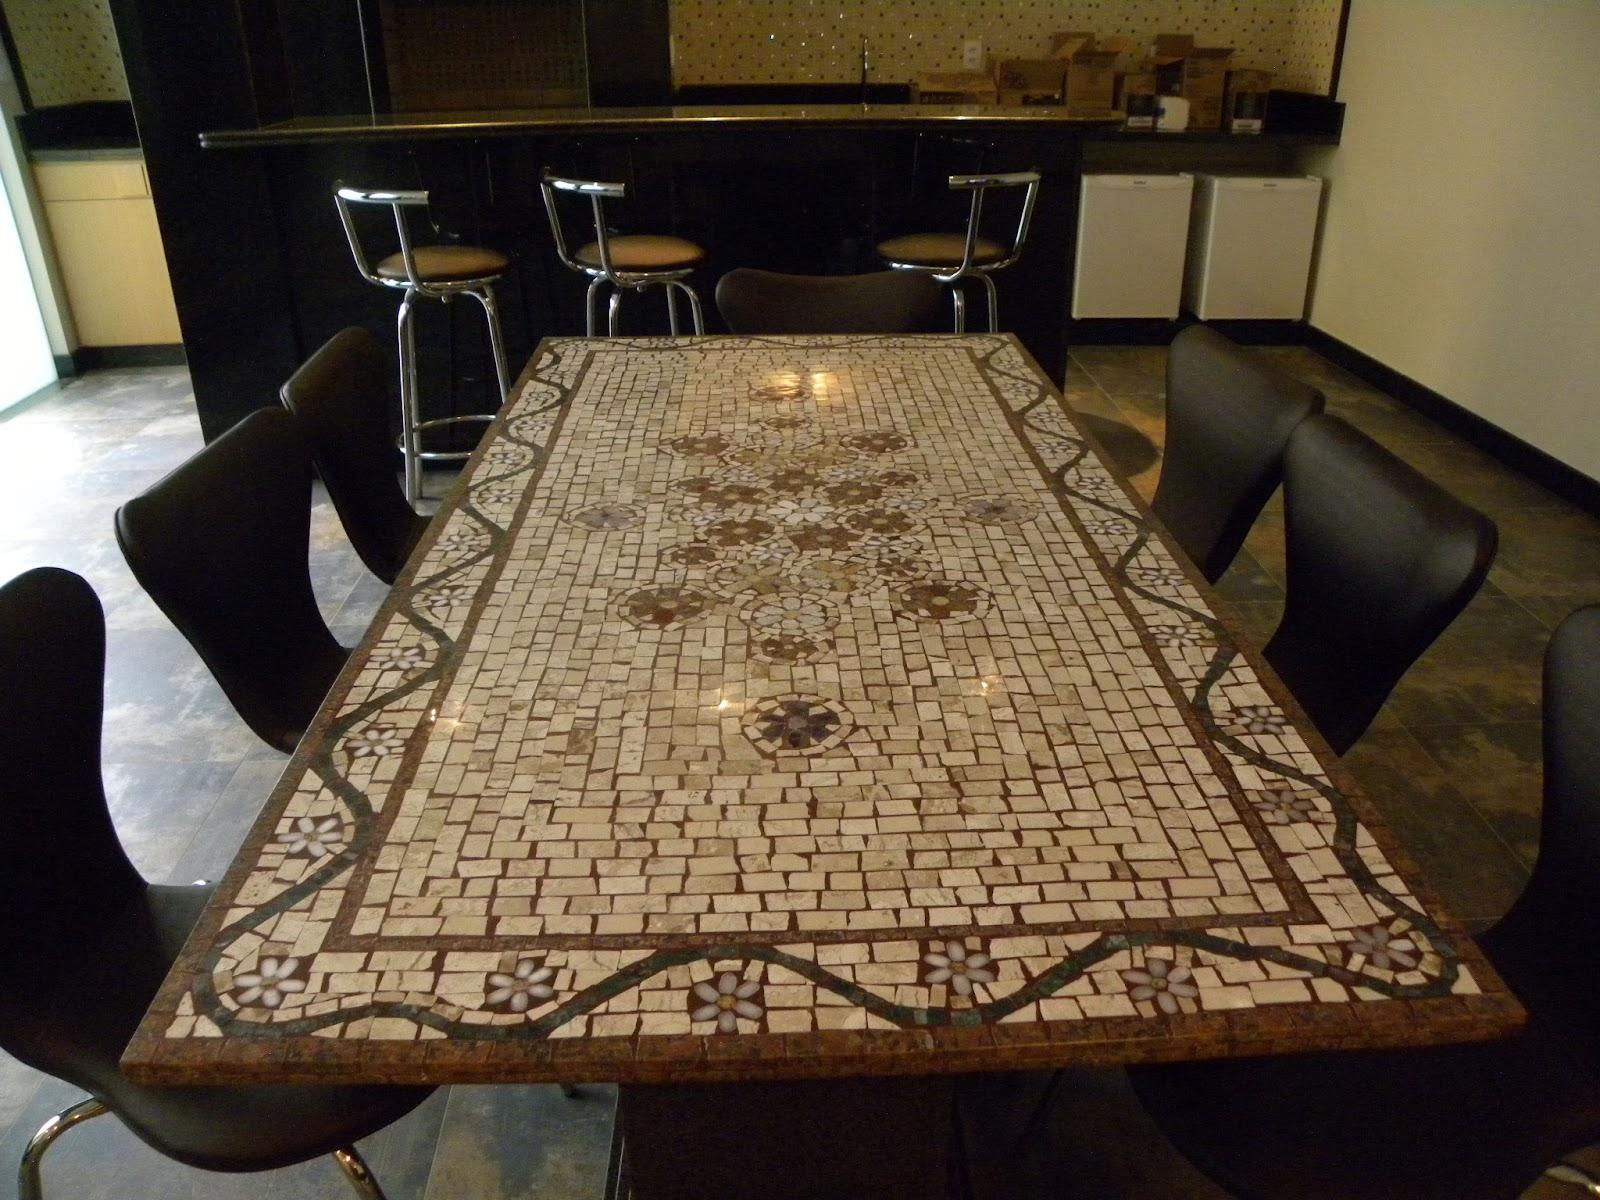 Mesas de mosaicos mesas de mosaicos mesas de mosaicos - Mesas mosaico segunda mano ...